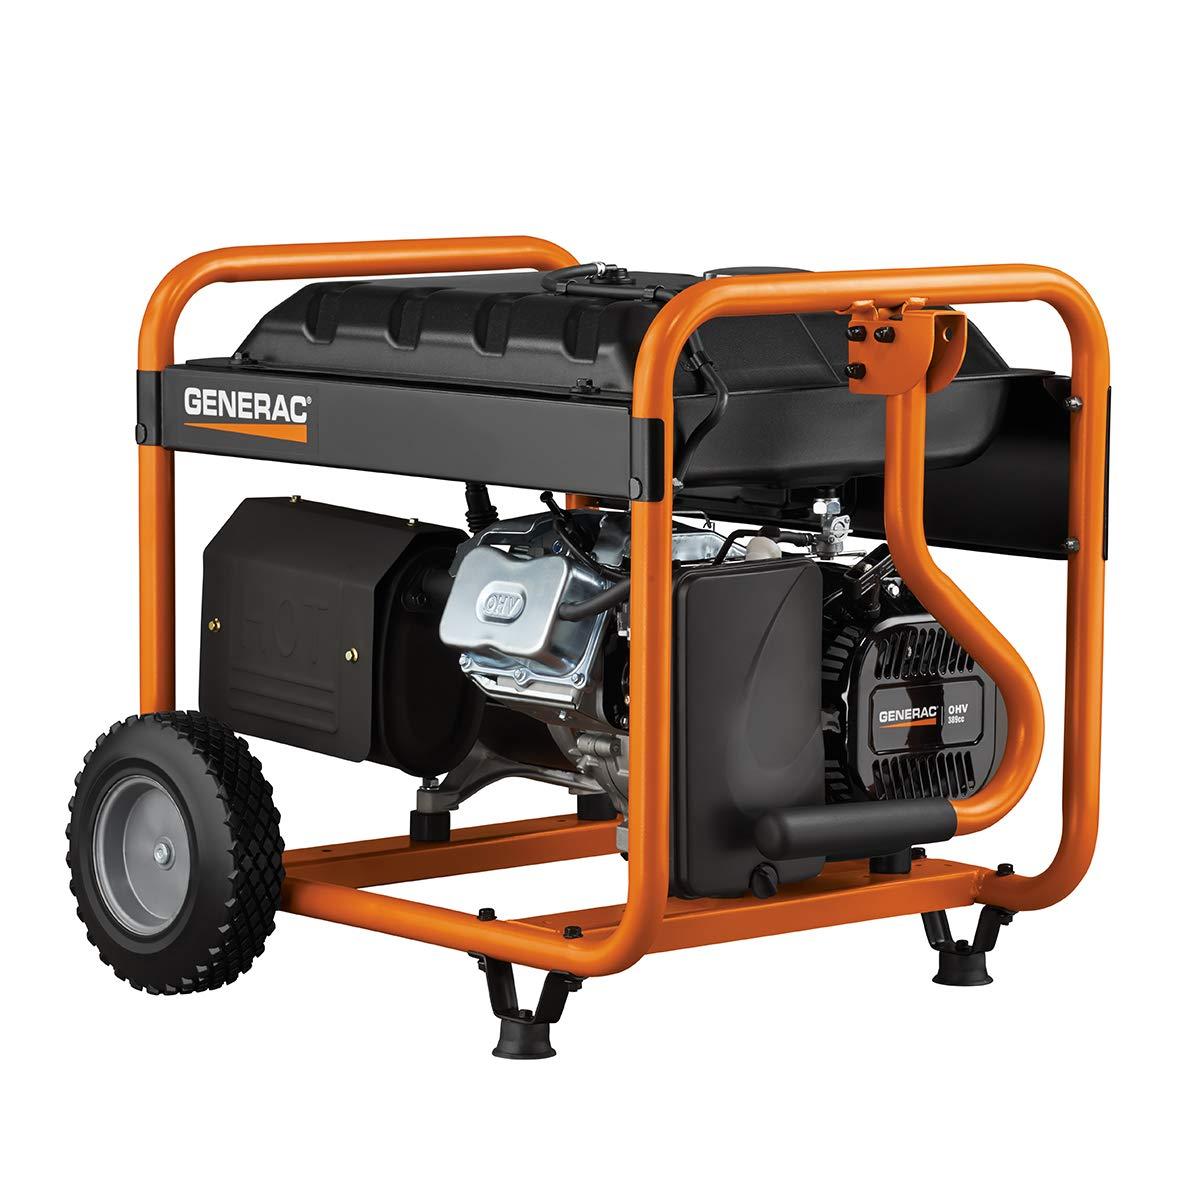 Generac 5975 5500 Running Watts 6875 Starting Gp5000 Generator Wiring Diagrams Gas Powered Portable Csa Approved Garden Outdoor